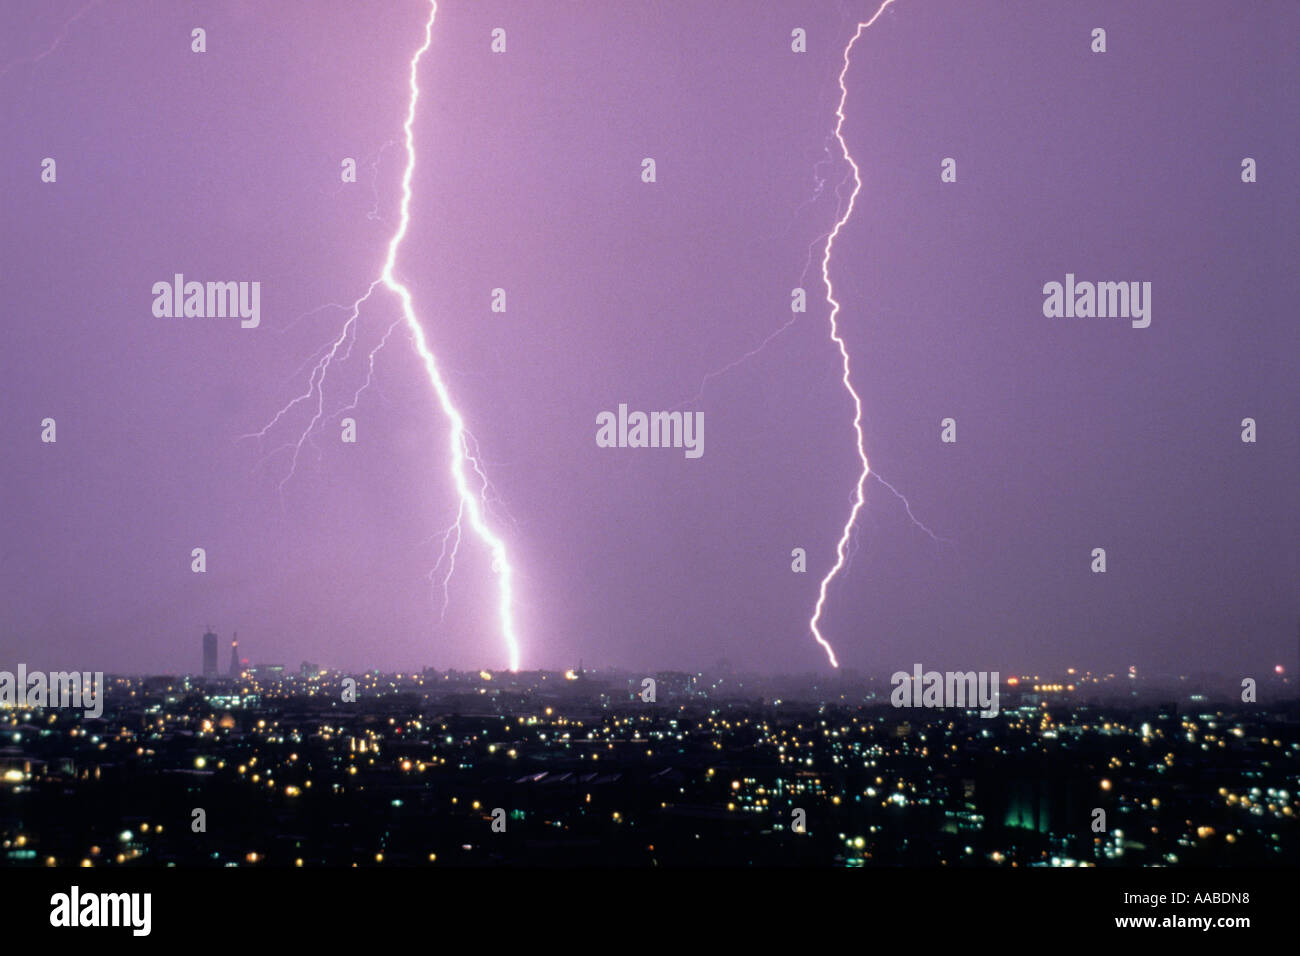 Lightning bolts over Manila, Philippines - Stock Image